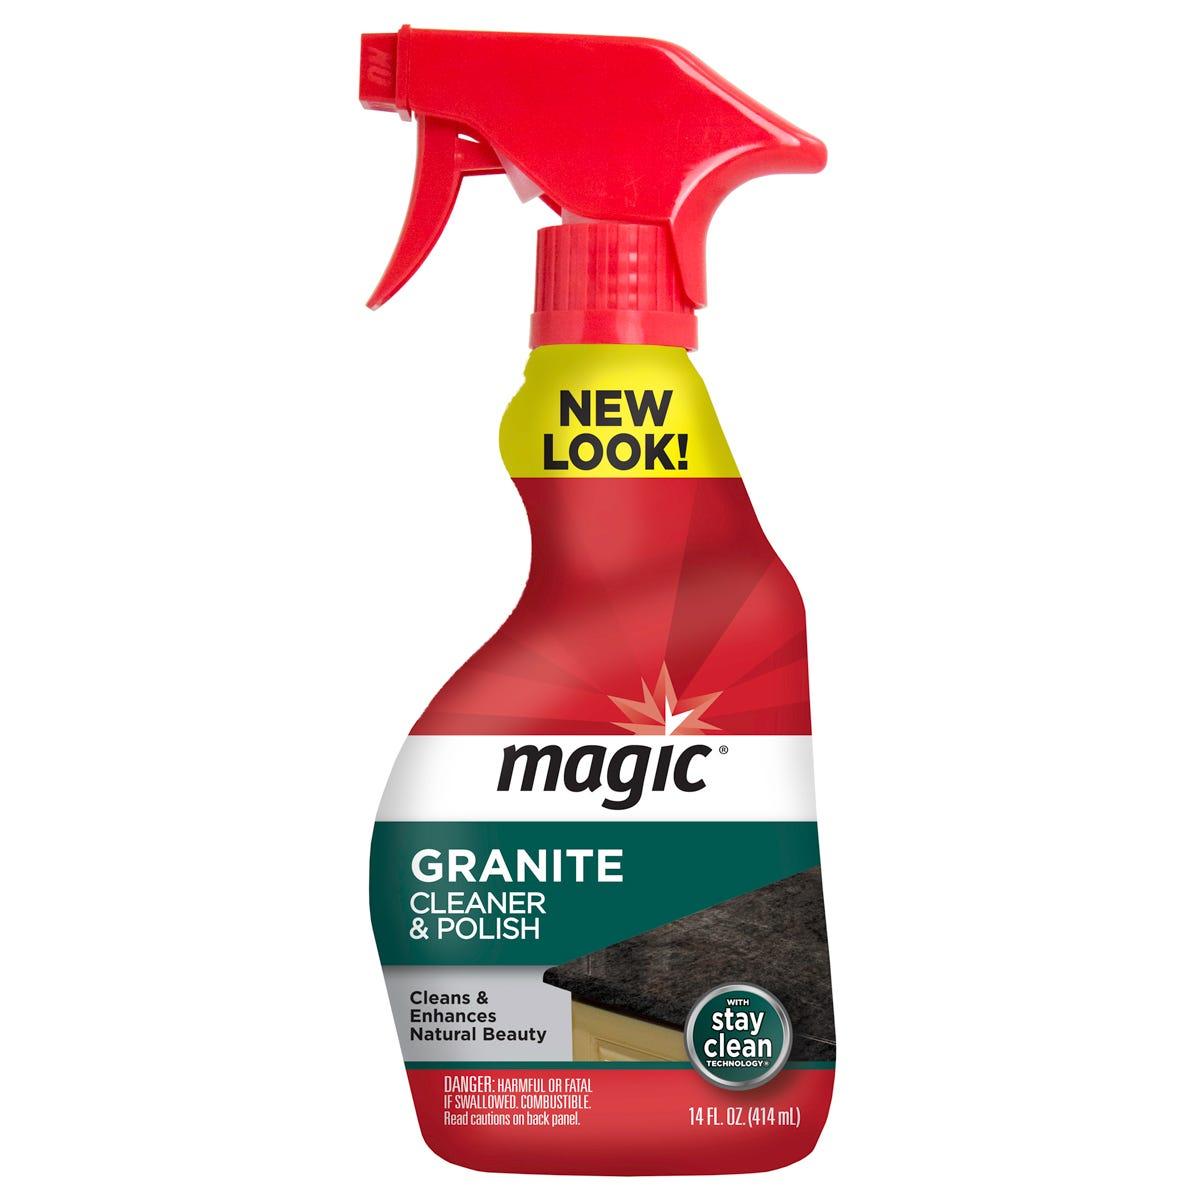 https://googone.com/media/catalog/product/m/a/magic-granite-cleaner-spray_front.jpg